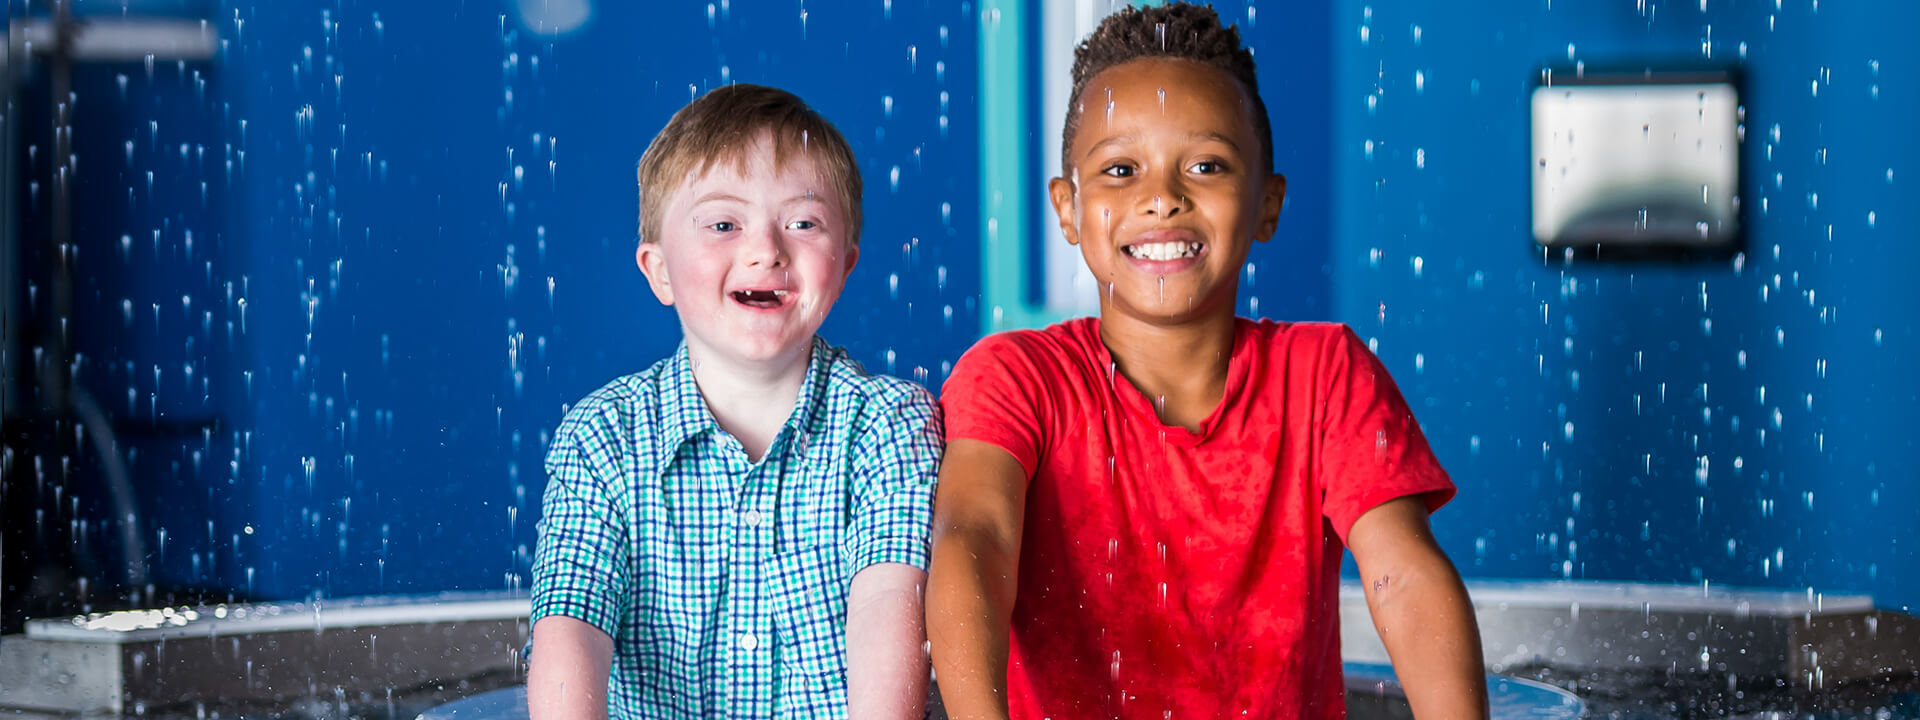 Two-children-playfully-interacting-in-KidsTown-exhibit